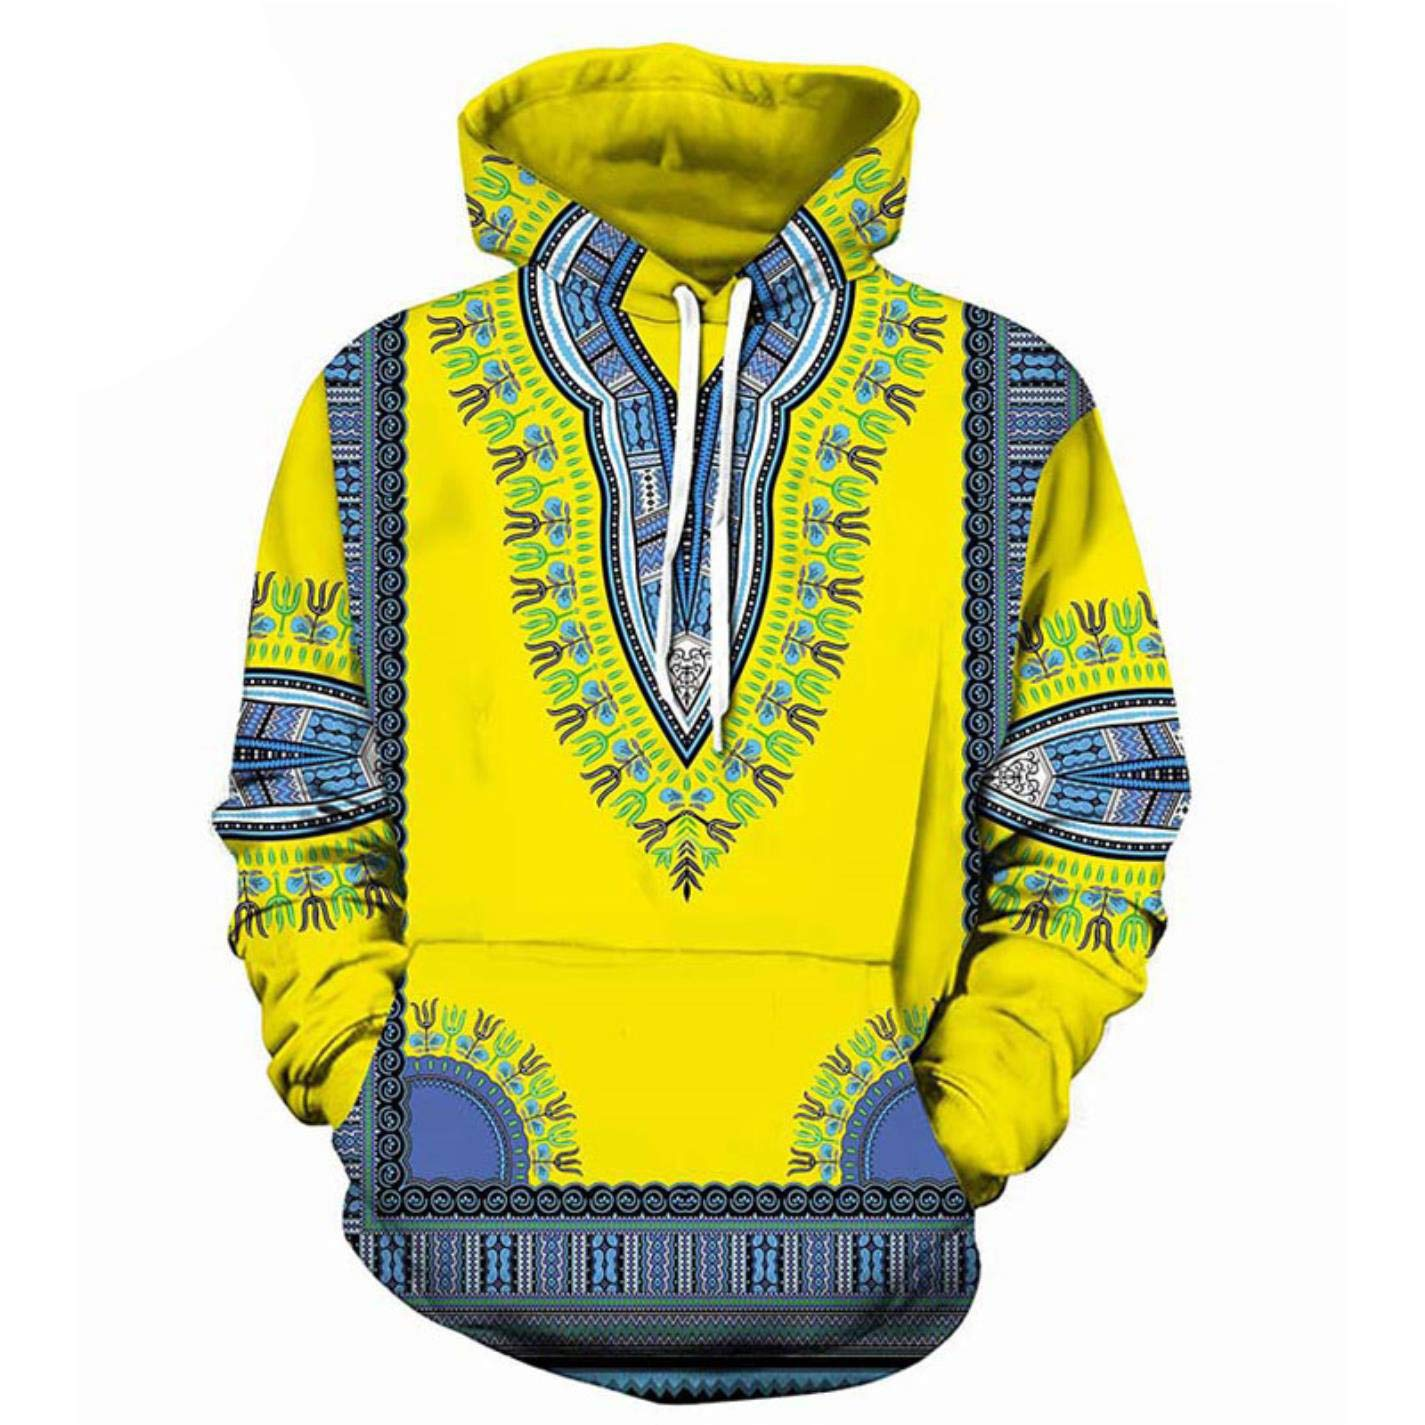 ACTJC African Clothing Casual Hooded Sweatshirt Men Women Fashion African Dashiki at Amazon Mens Clothing store: